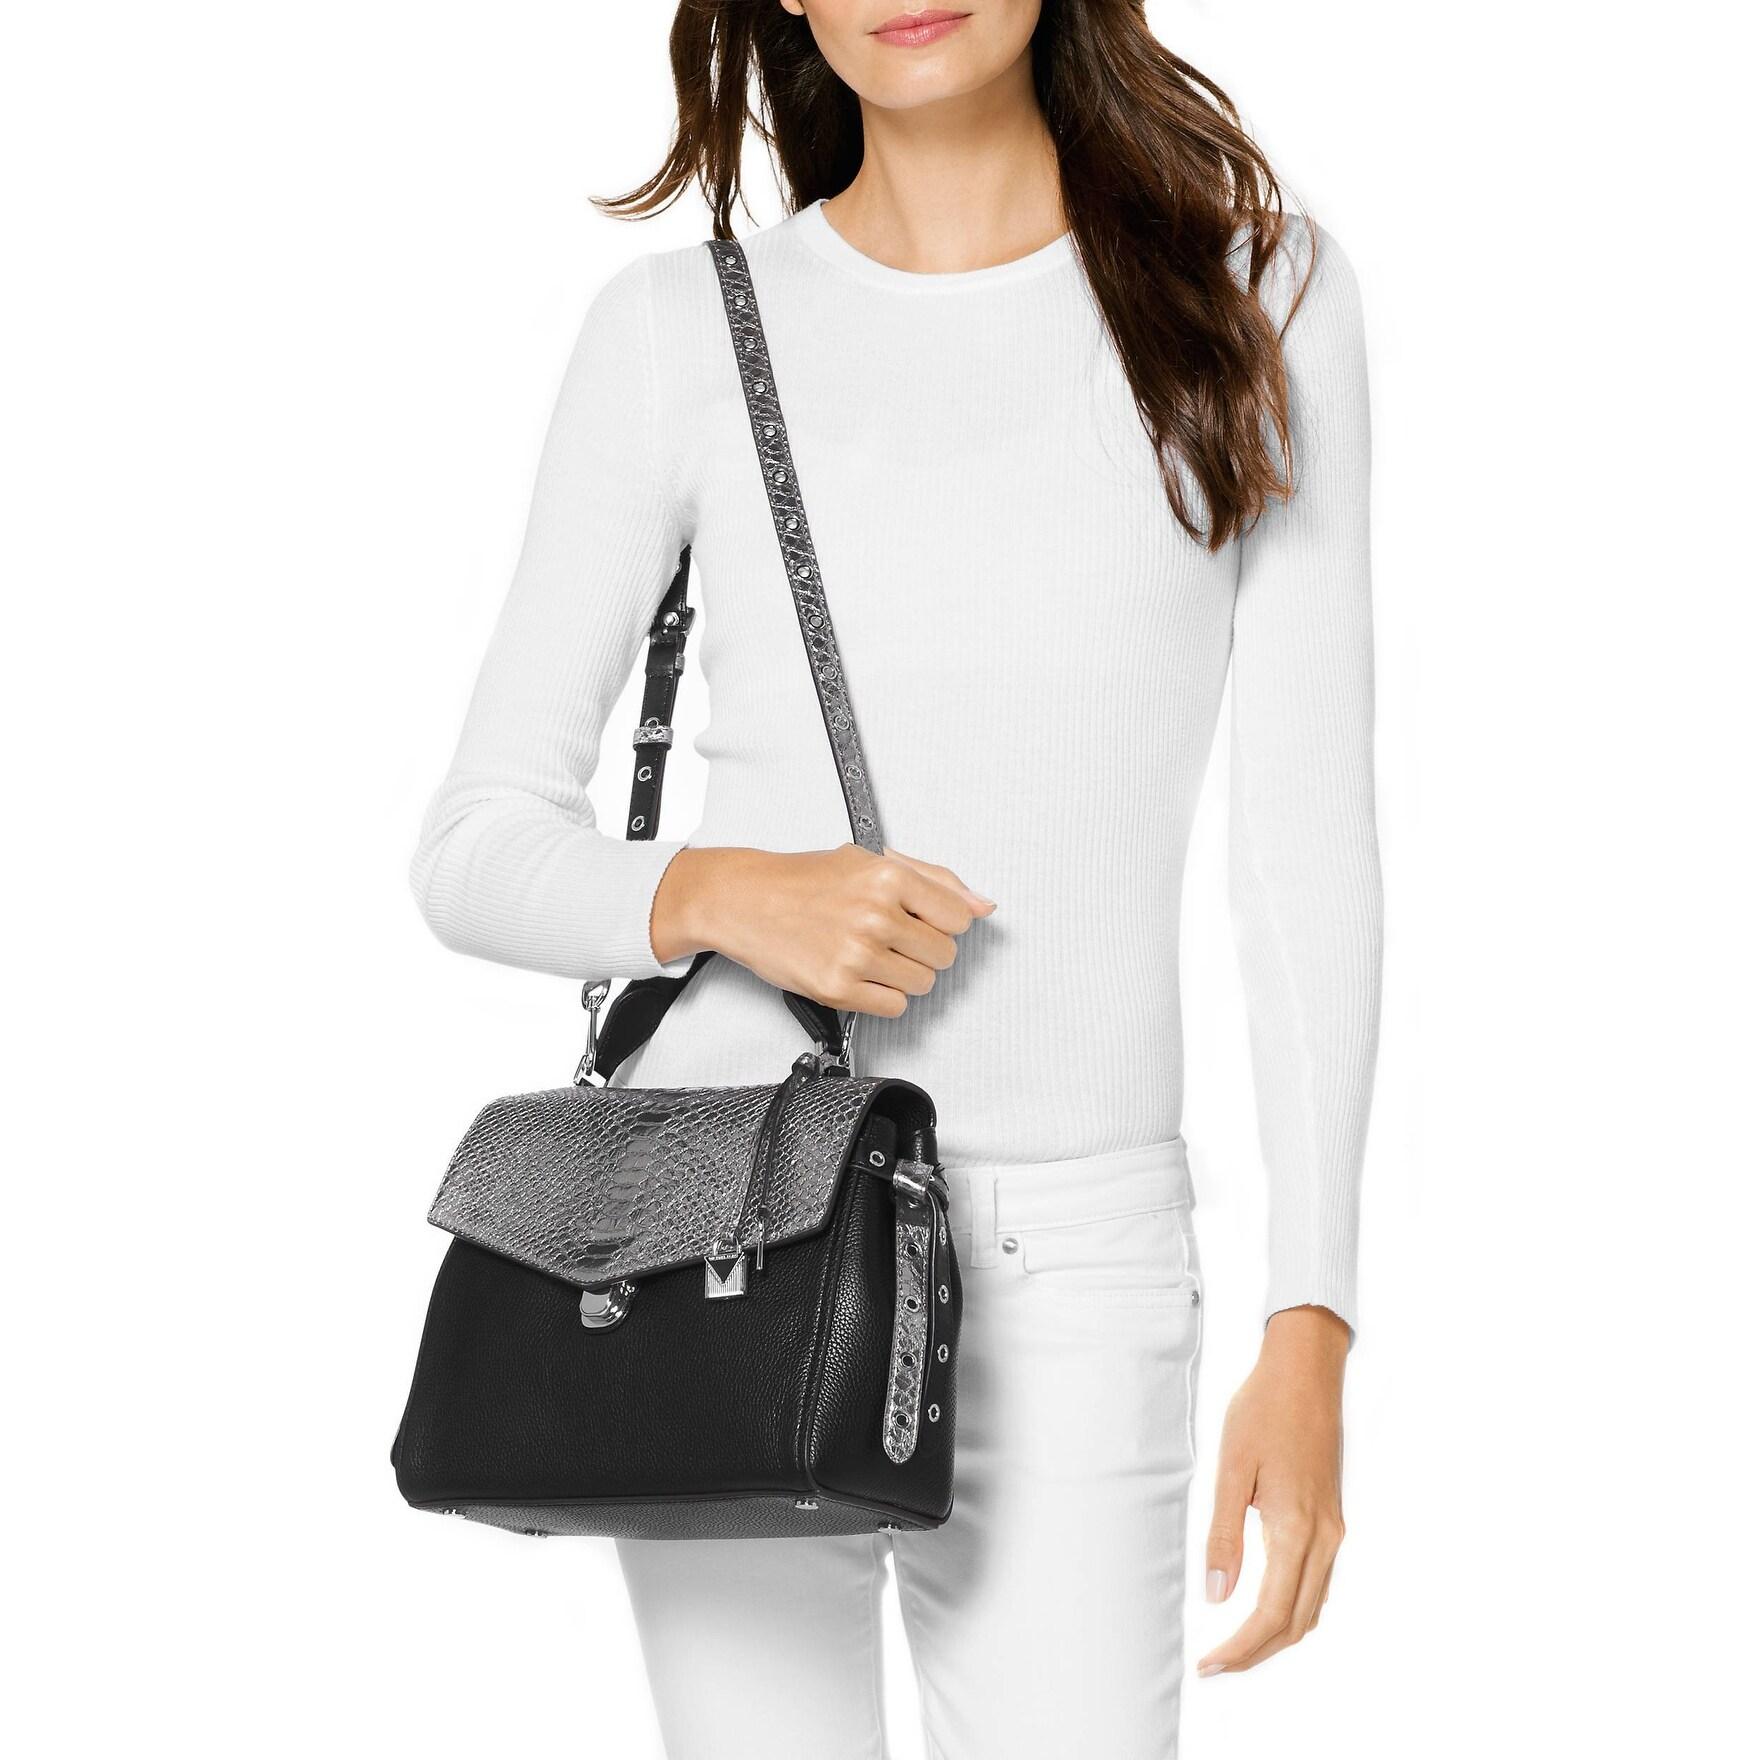 e363a6673de591 Shop Michael Kors Black Pewter Bristol Metallic Satchel Leather Handbag -  Free Shipping Today - Overstock - 22023240